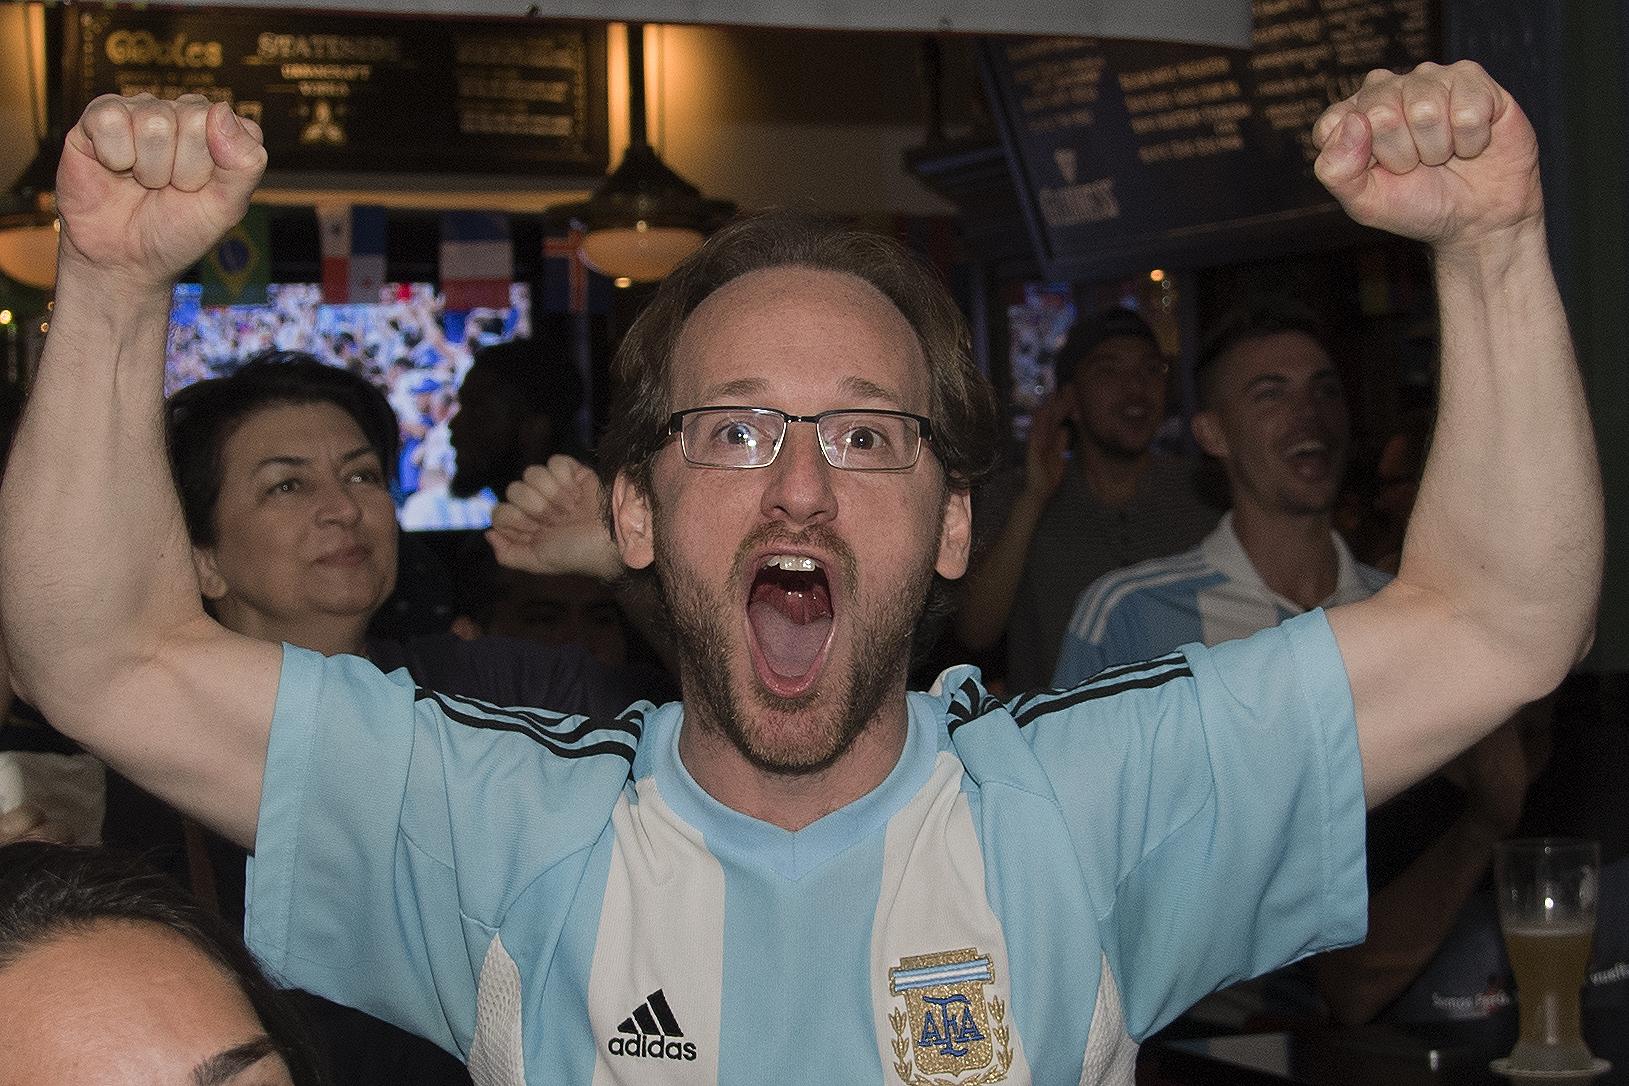 Argentina fan Tomas Alziel celebrates a score during a World Cup game against Nigeria at Fado Restaurant Bar on Locust Street.